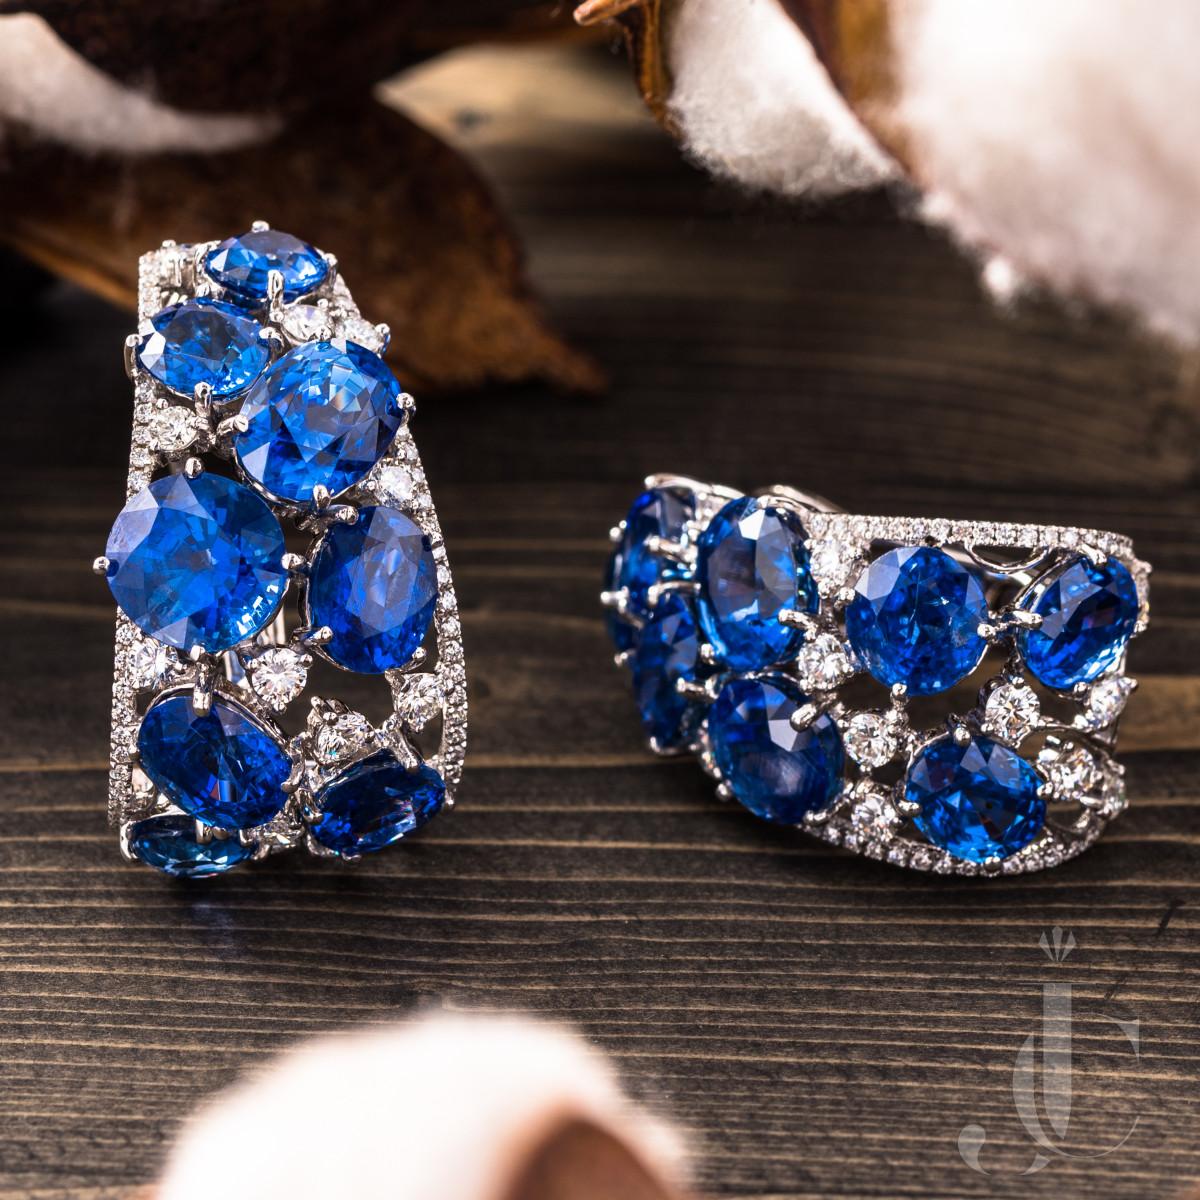 42 Carats  of NH Burma Sapphire and Diamond Earrings